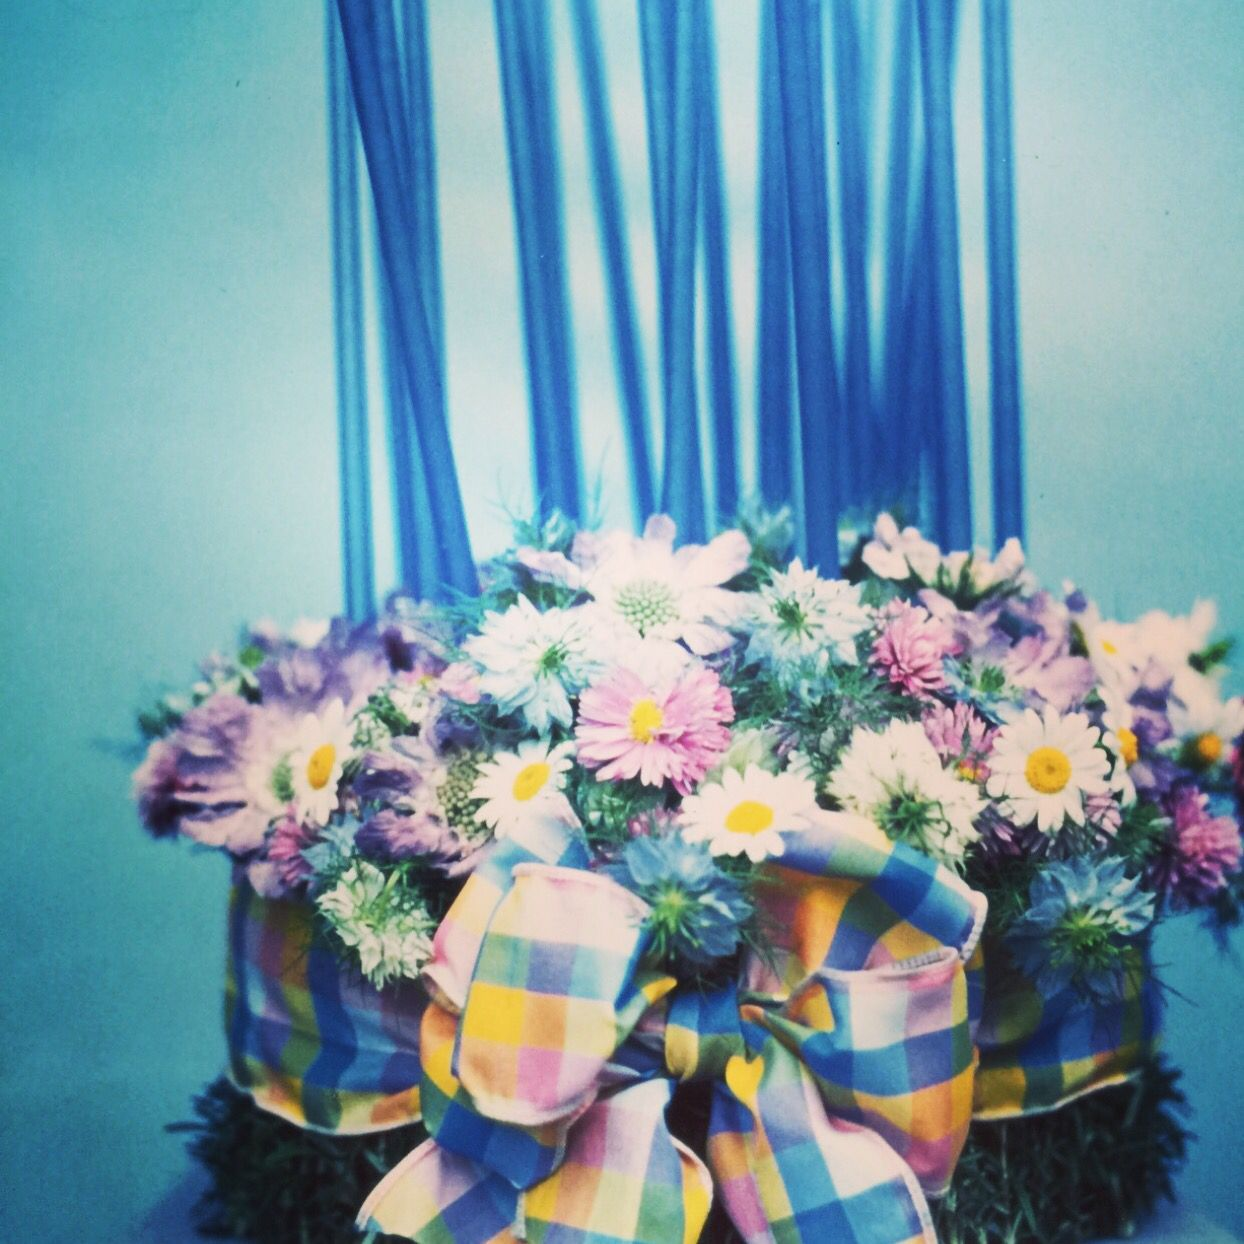 Birthday cake arrangement happybirthday floral floral